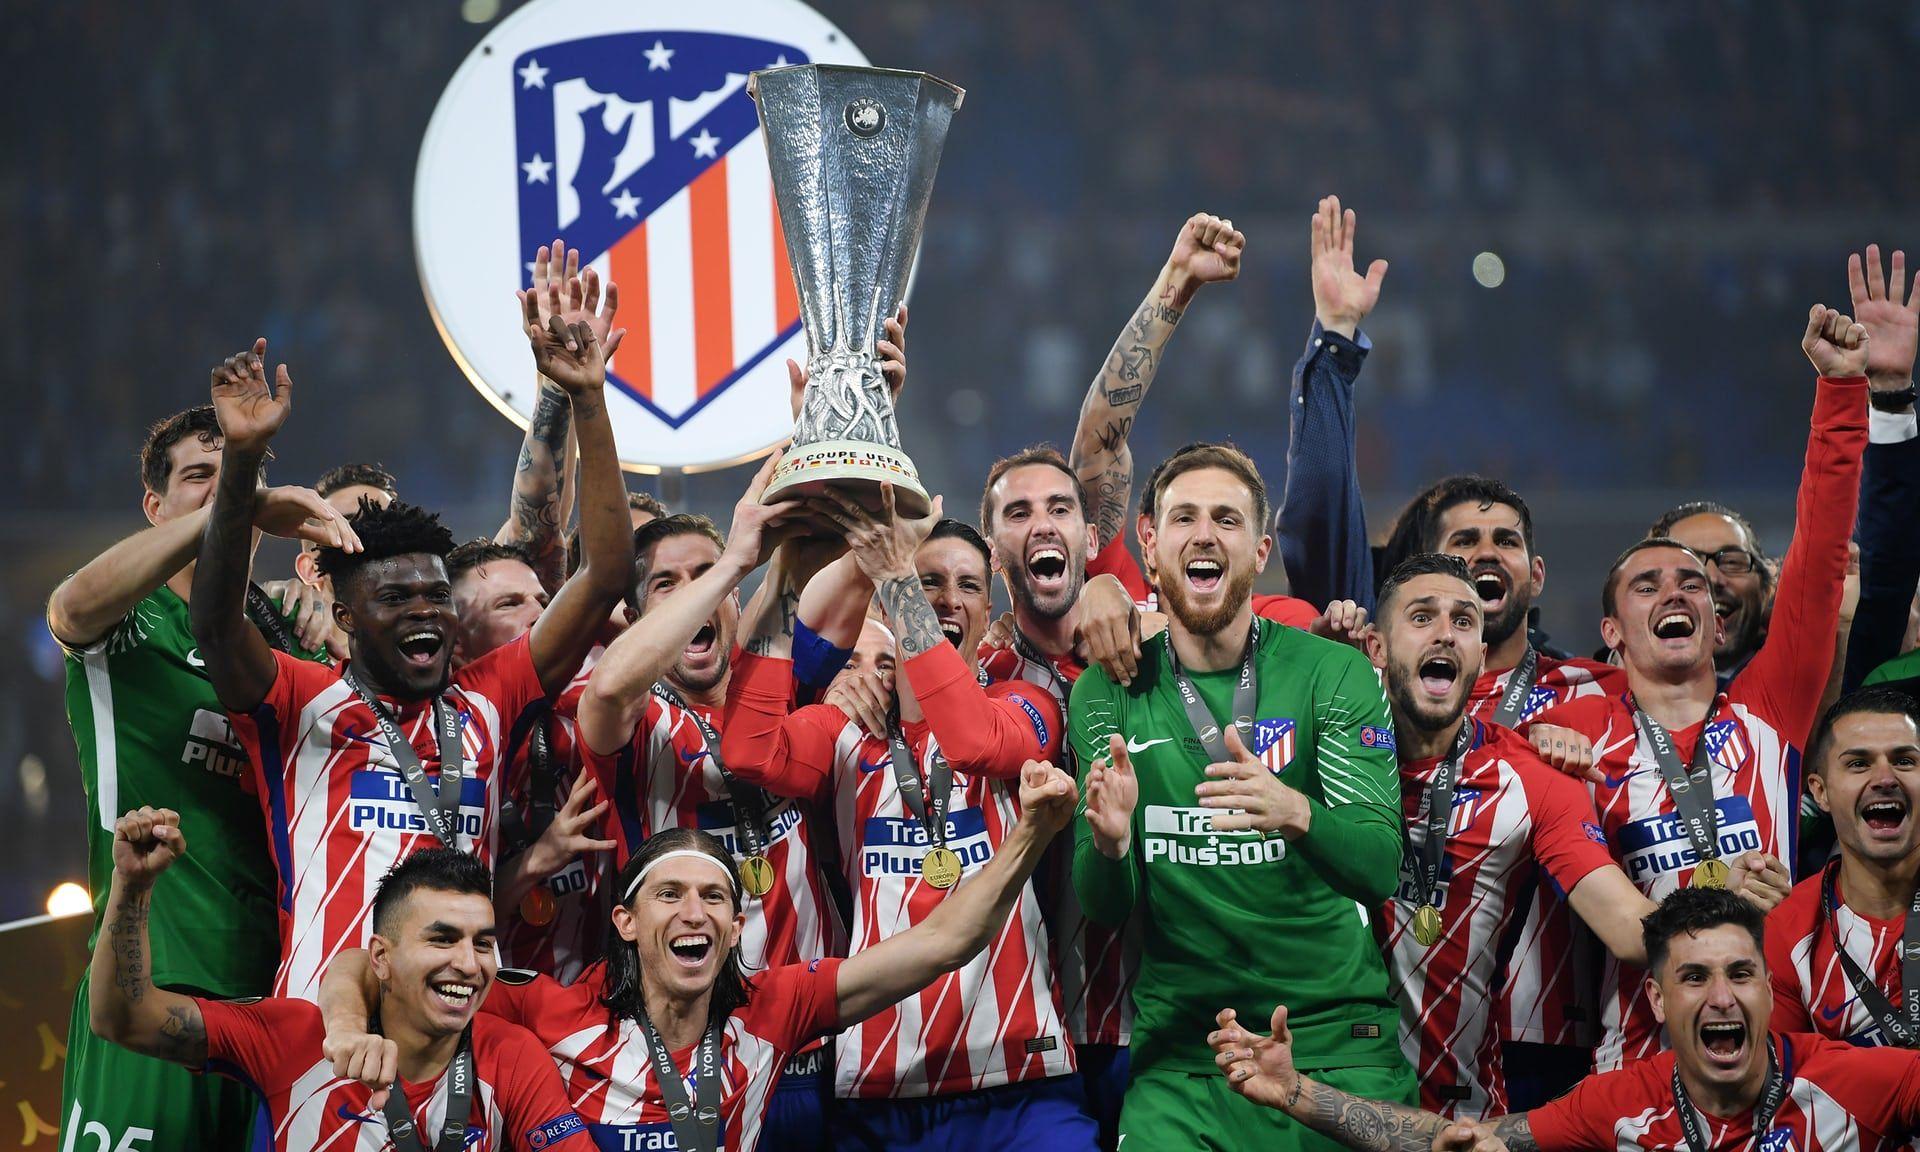 Marseille 03 Atlético Madrid 2018 Europa League final